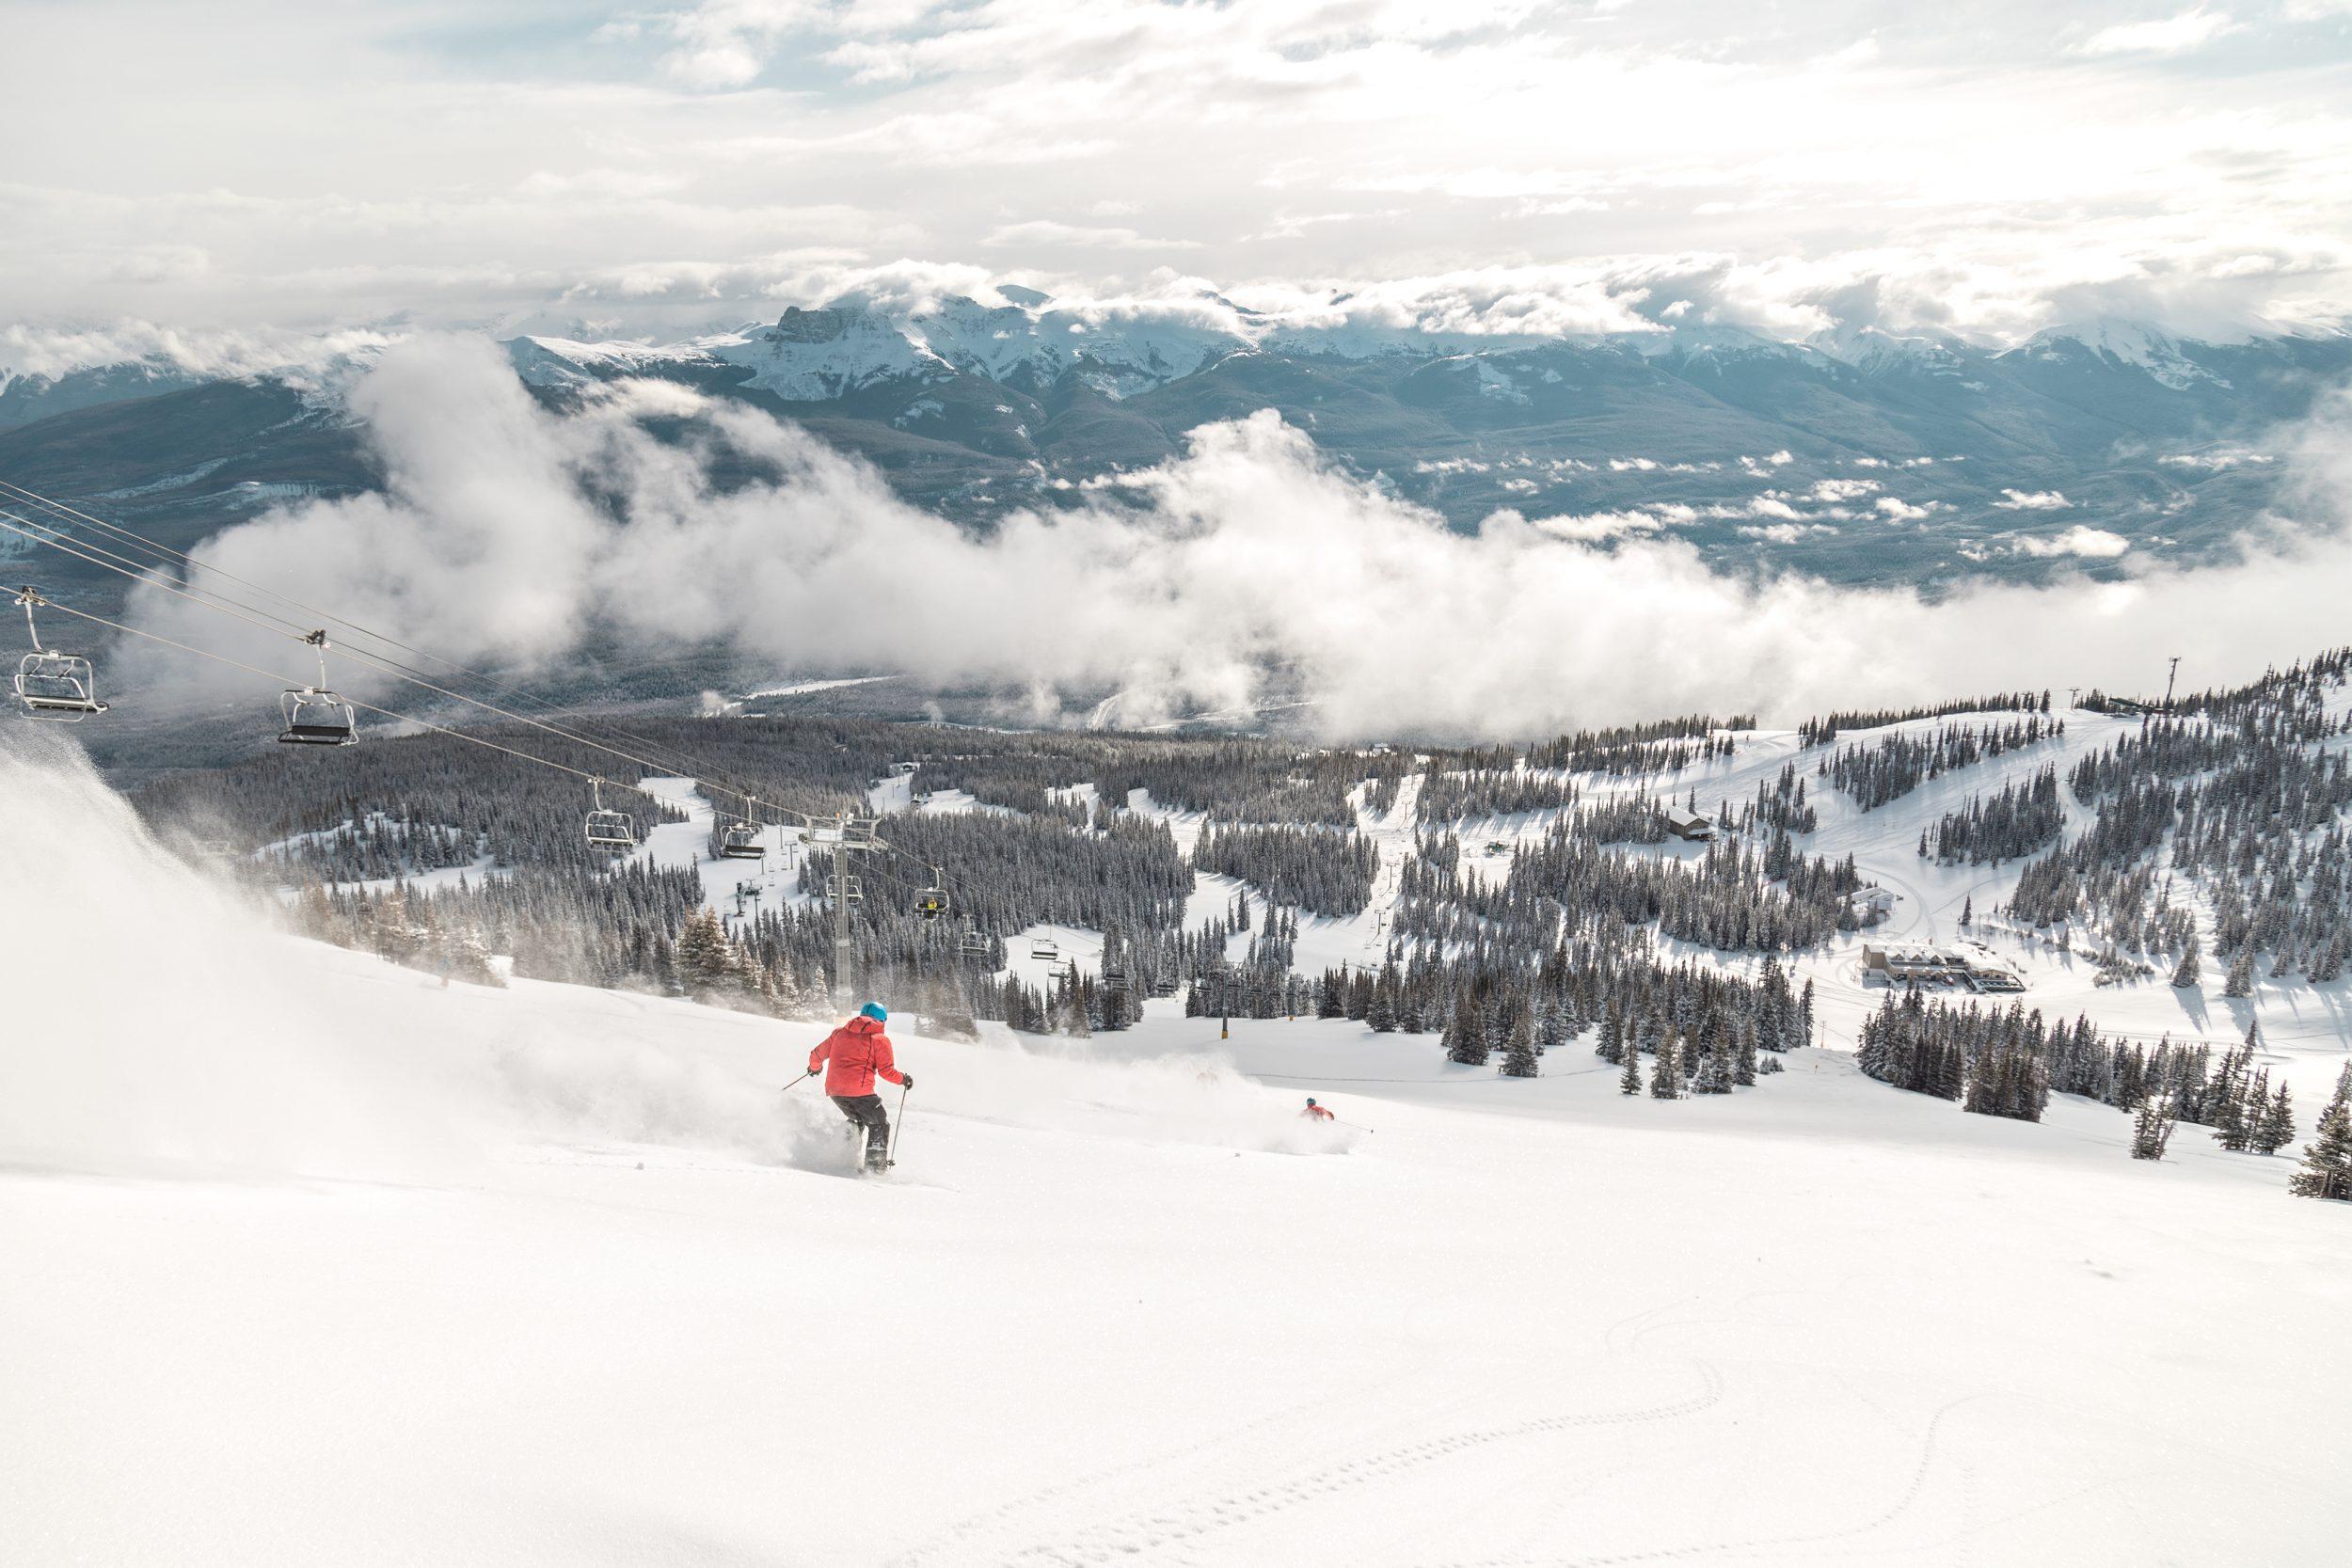 Wintersport Canada - Jasper National Park